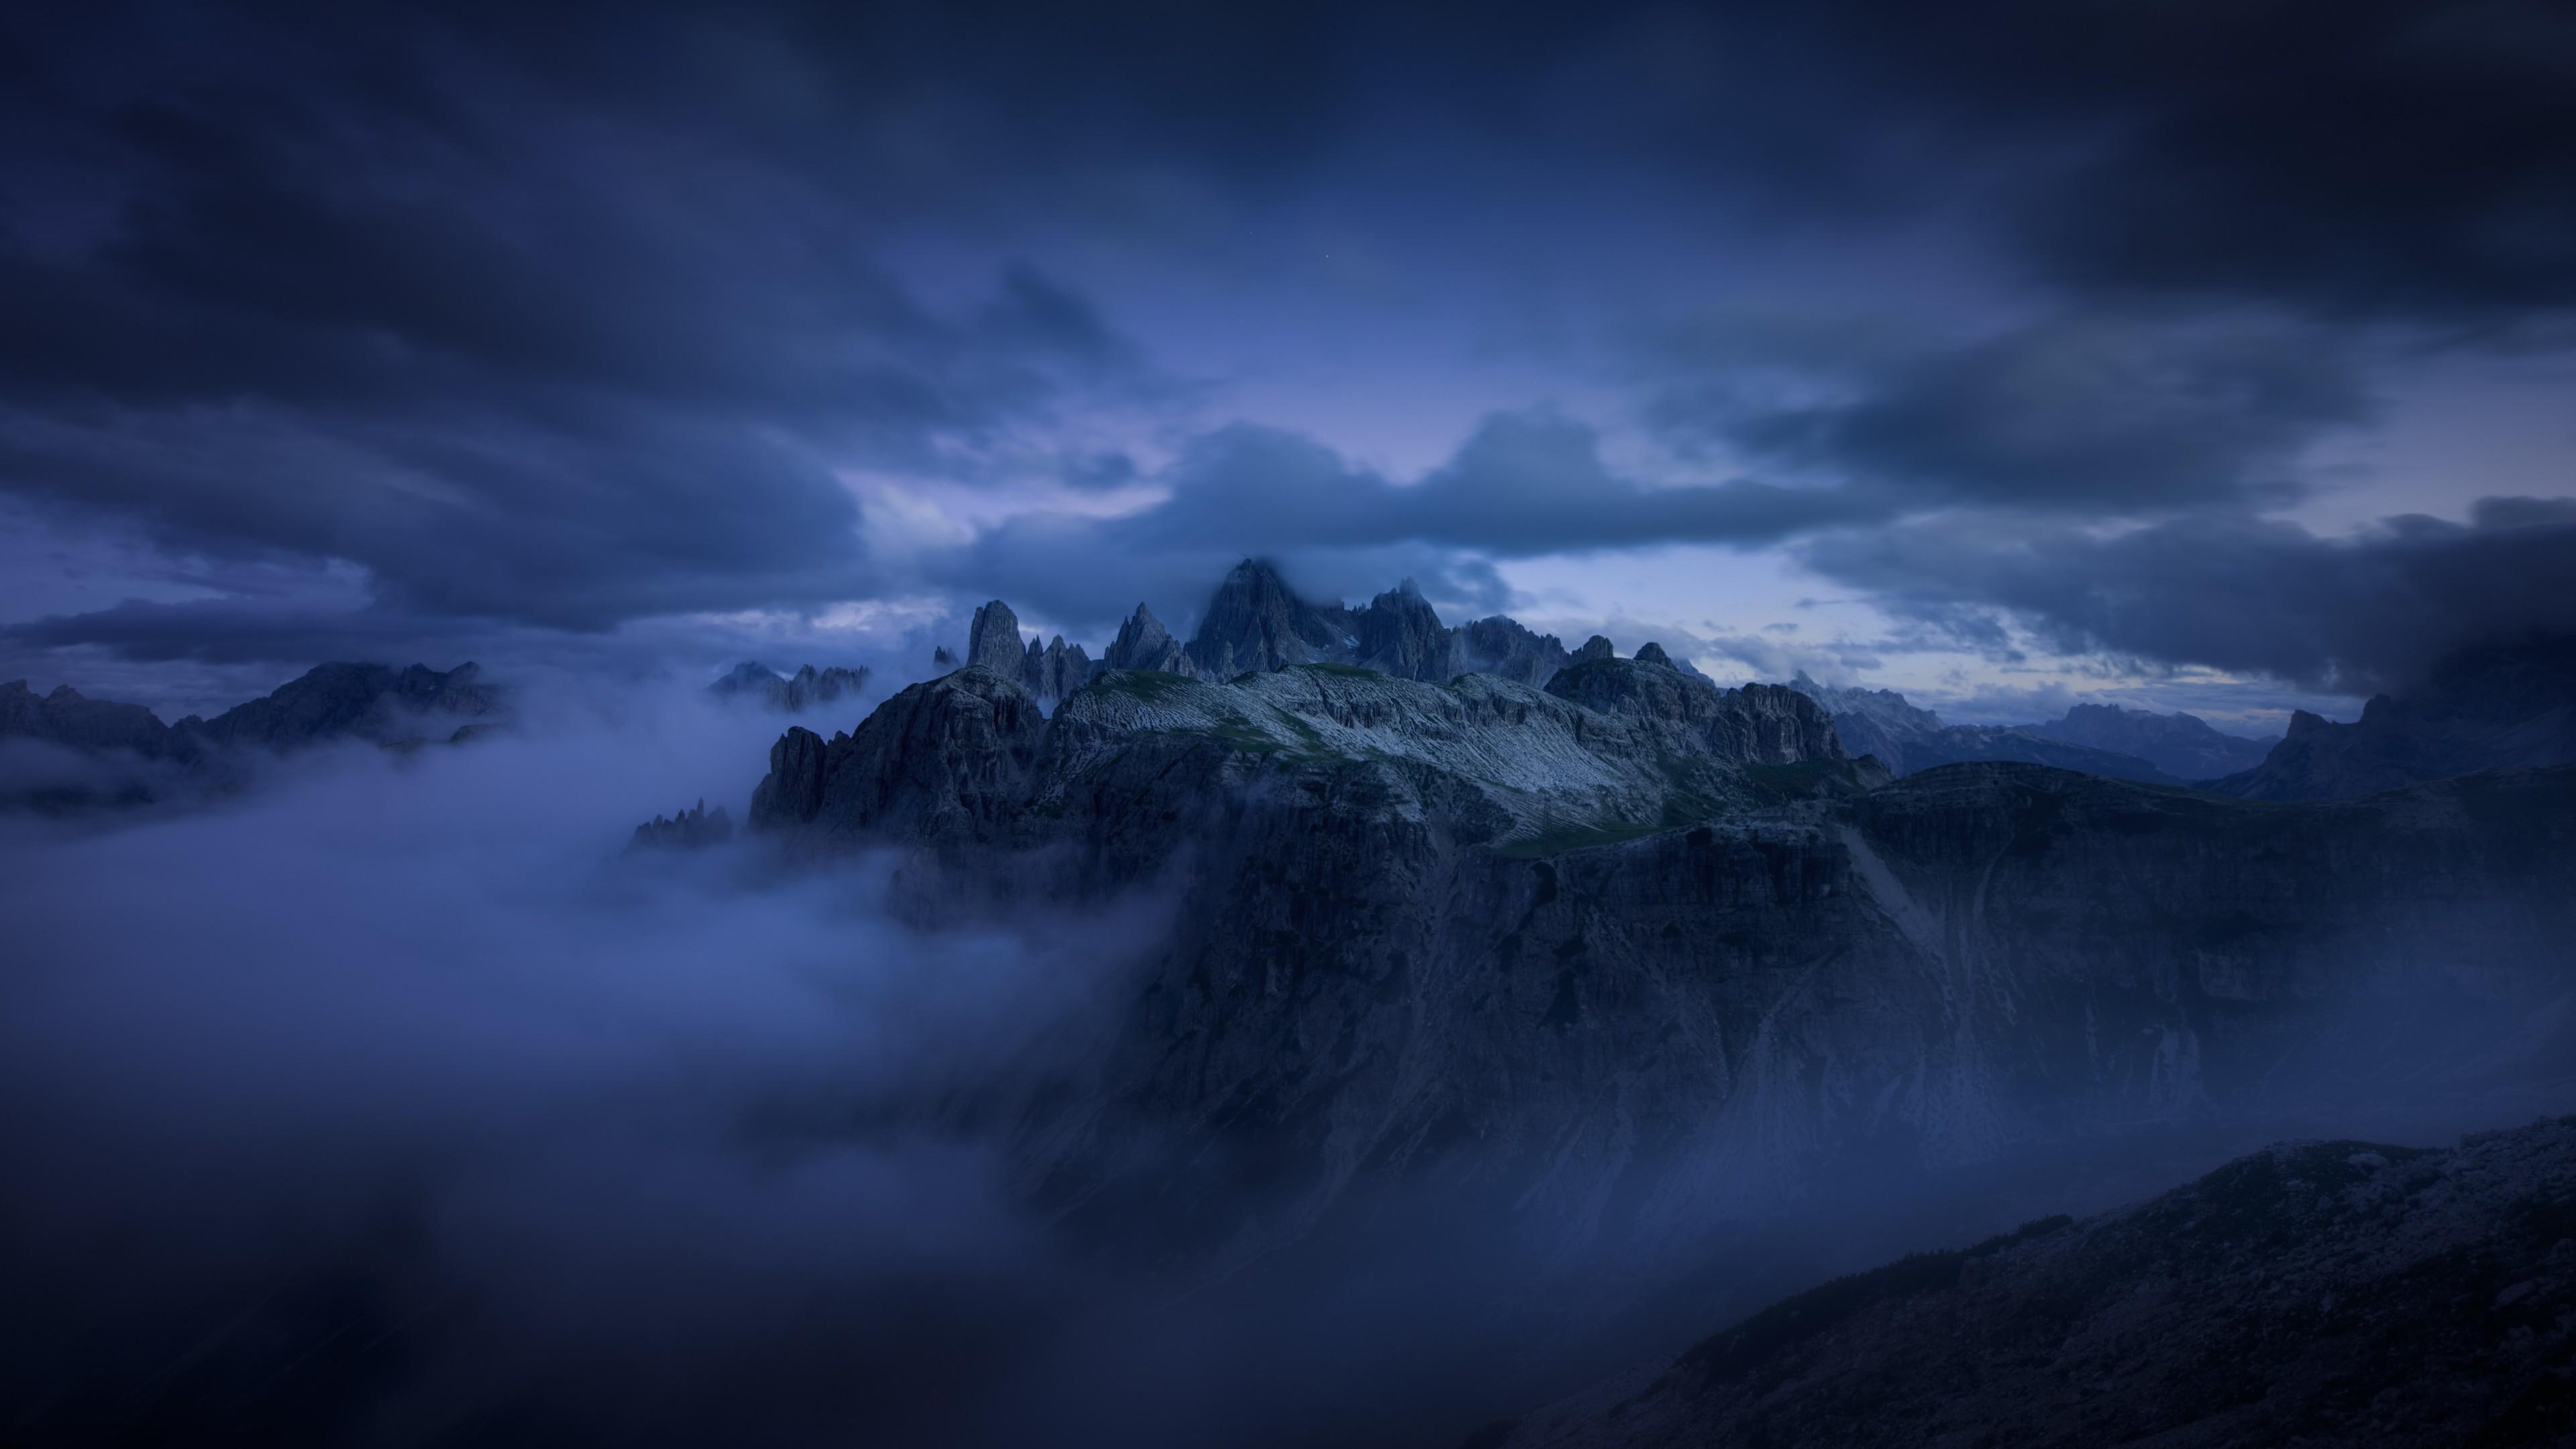 mountains cliff covered under fog mist 5k 1540143633 - Mountains Cliff Covered Under Fog Mist 5k - nature wallpapers, mountains wallpapers, mist wallpapers, hd-wallpapers, fog wallpapers, blue wallpapers, 4k-wallpapers